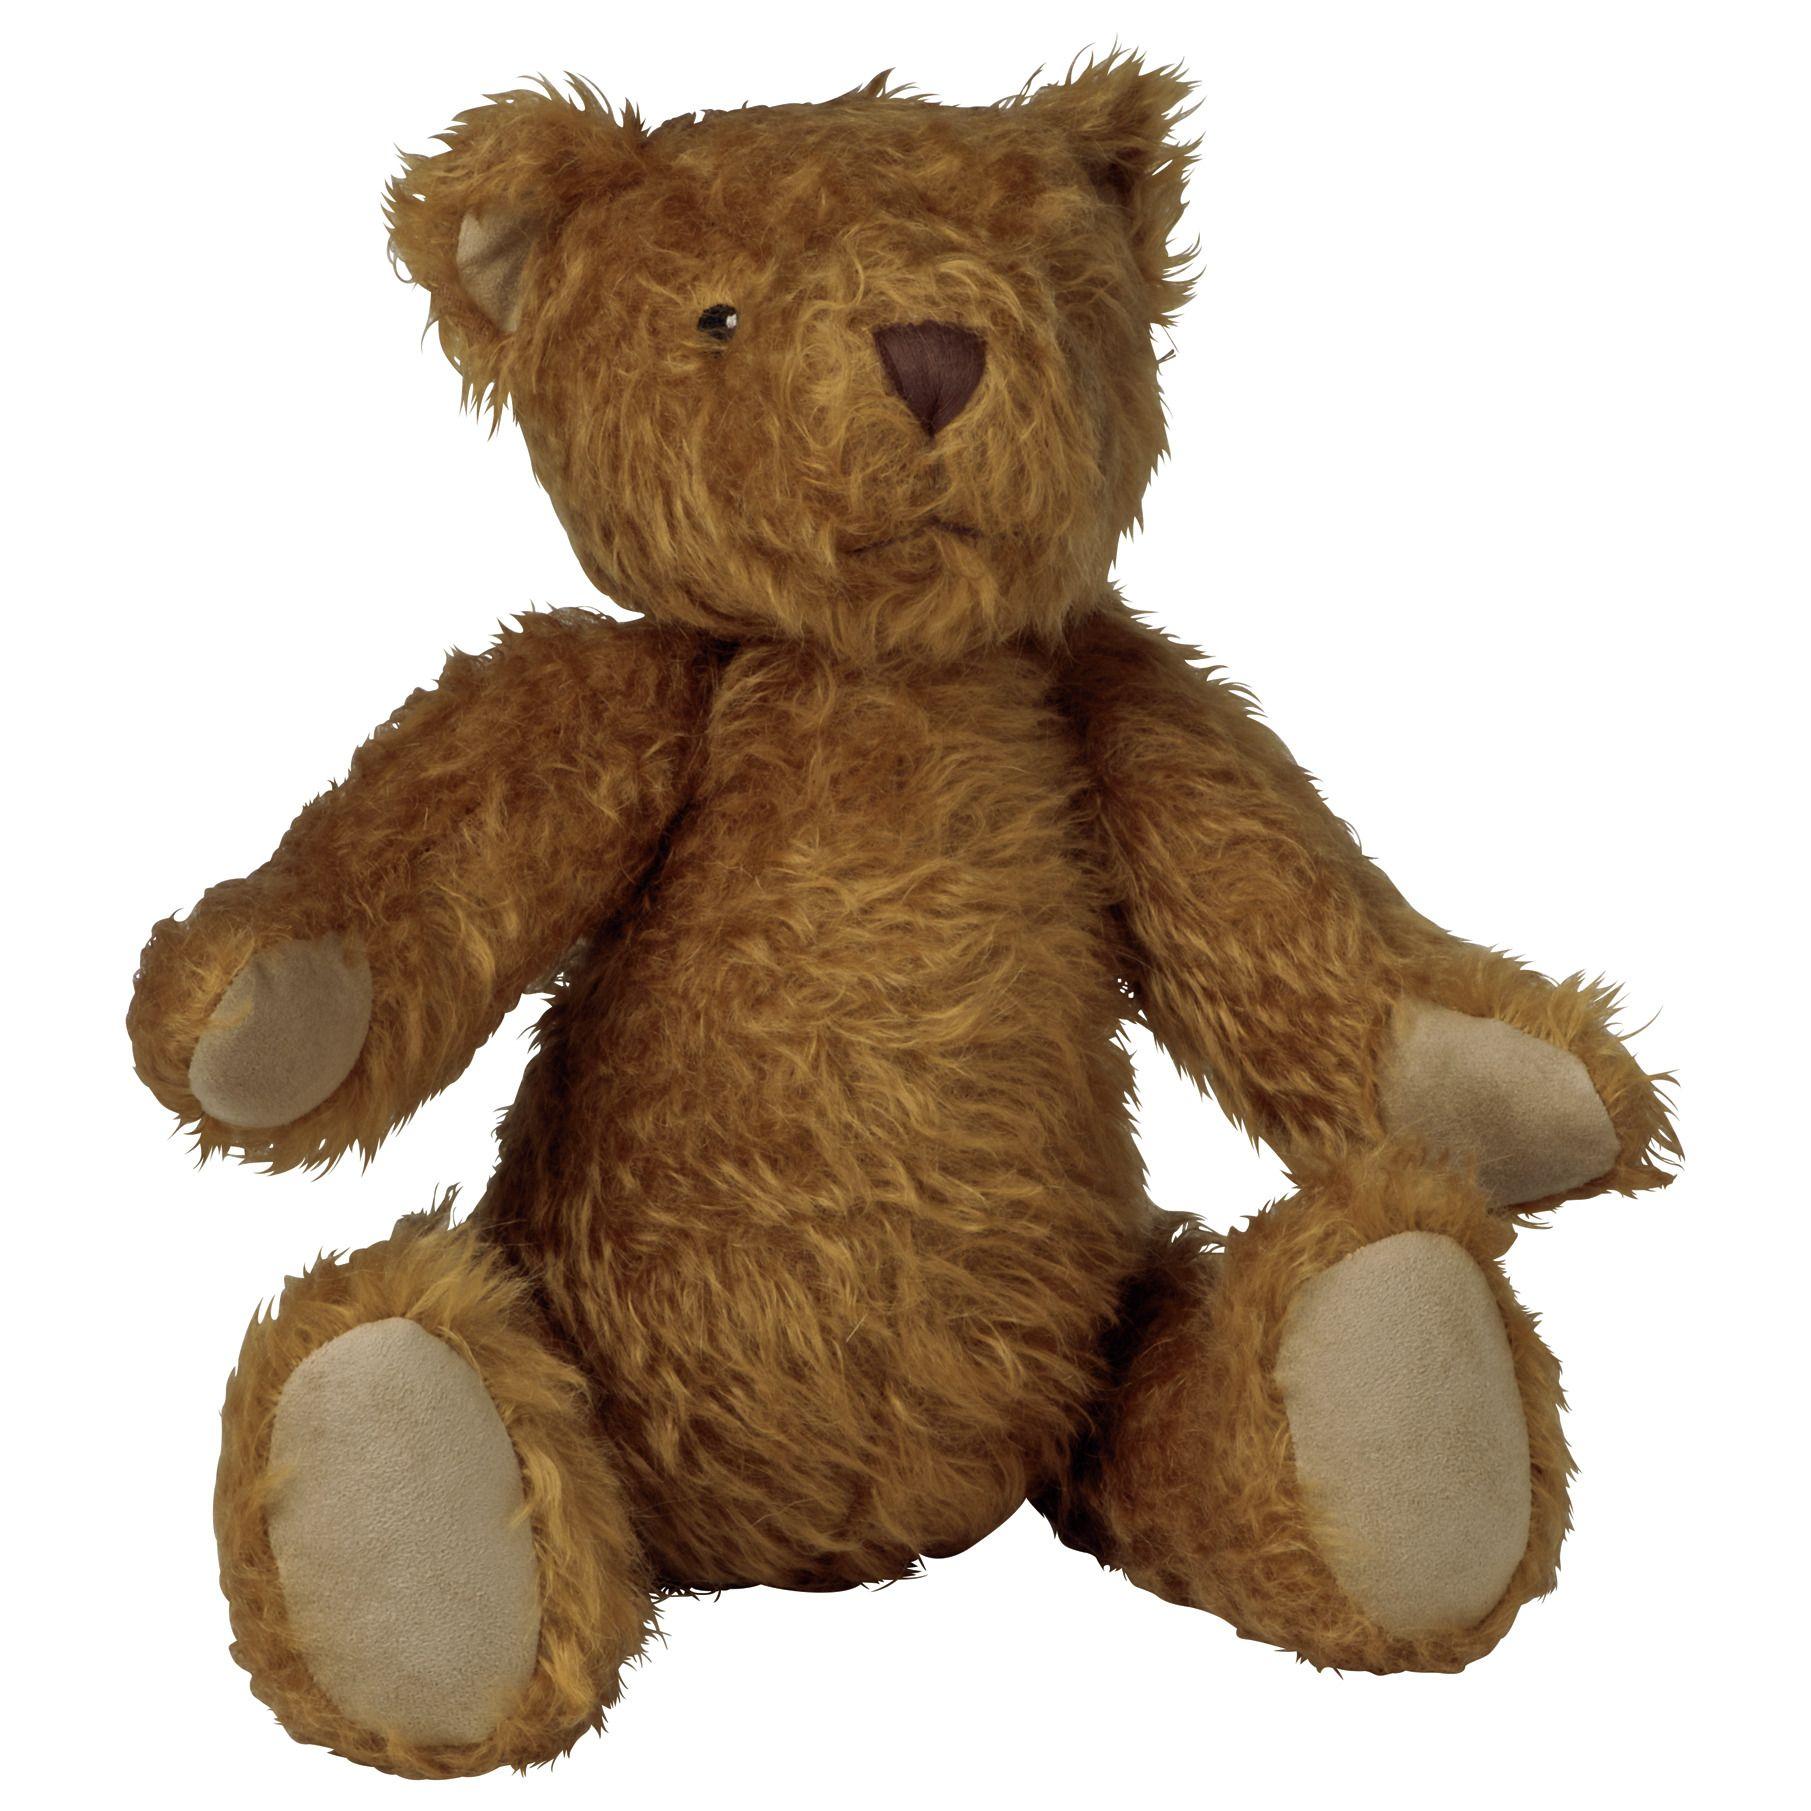 M&S Traditional Teddy Bear GBP 49.50